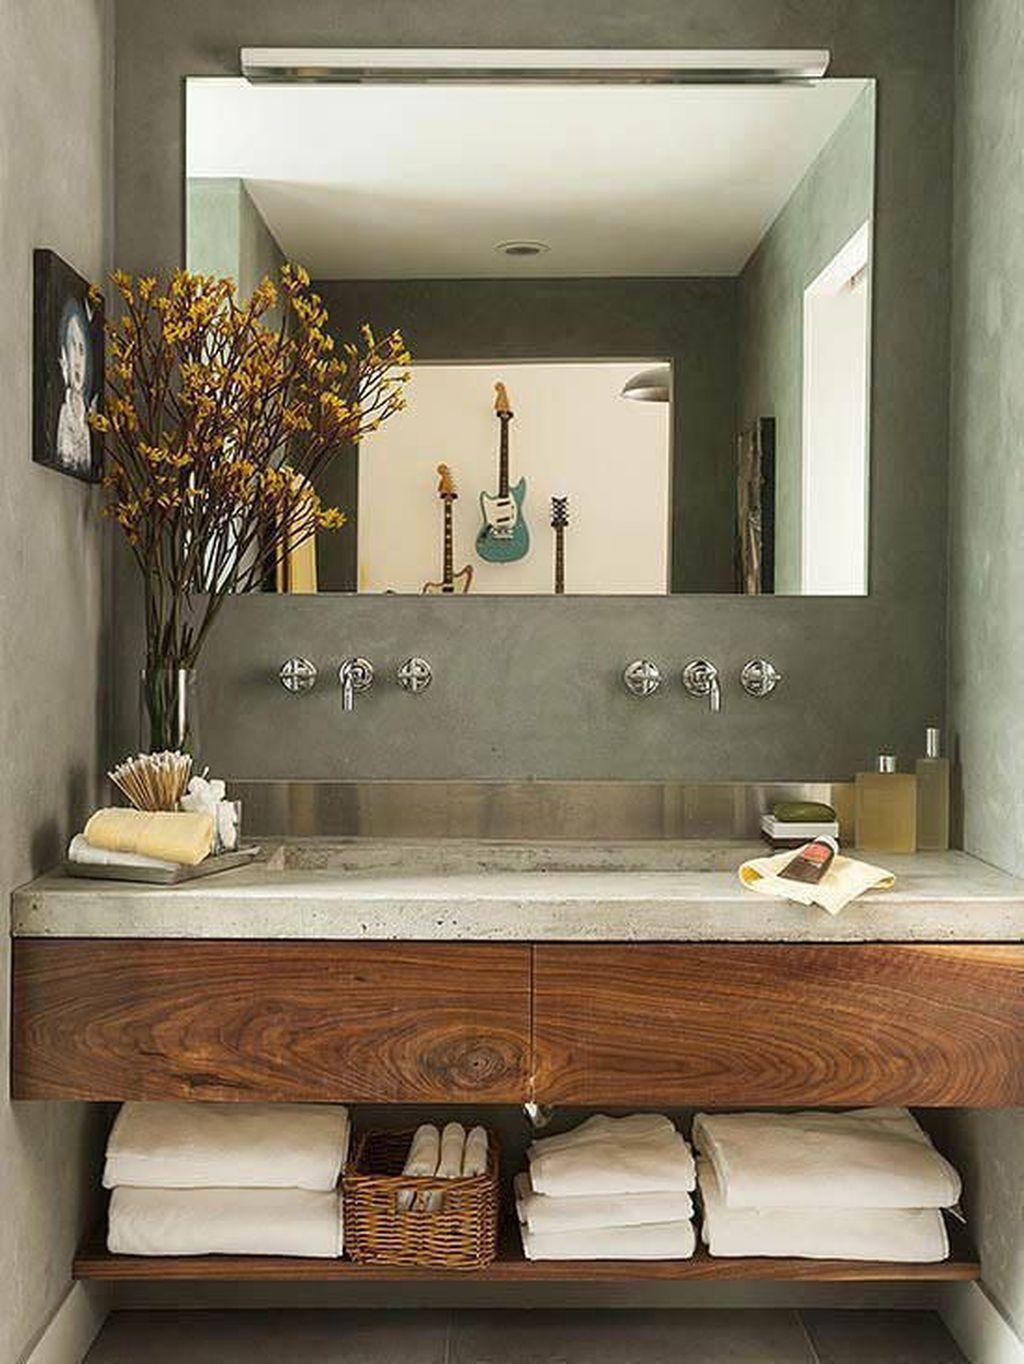 Admirable Rustic Modern Bathroom Design And Decor Ideas 29